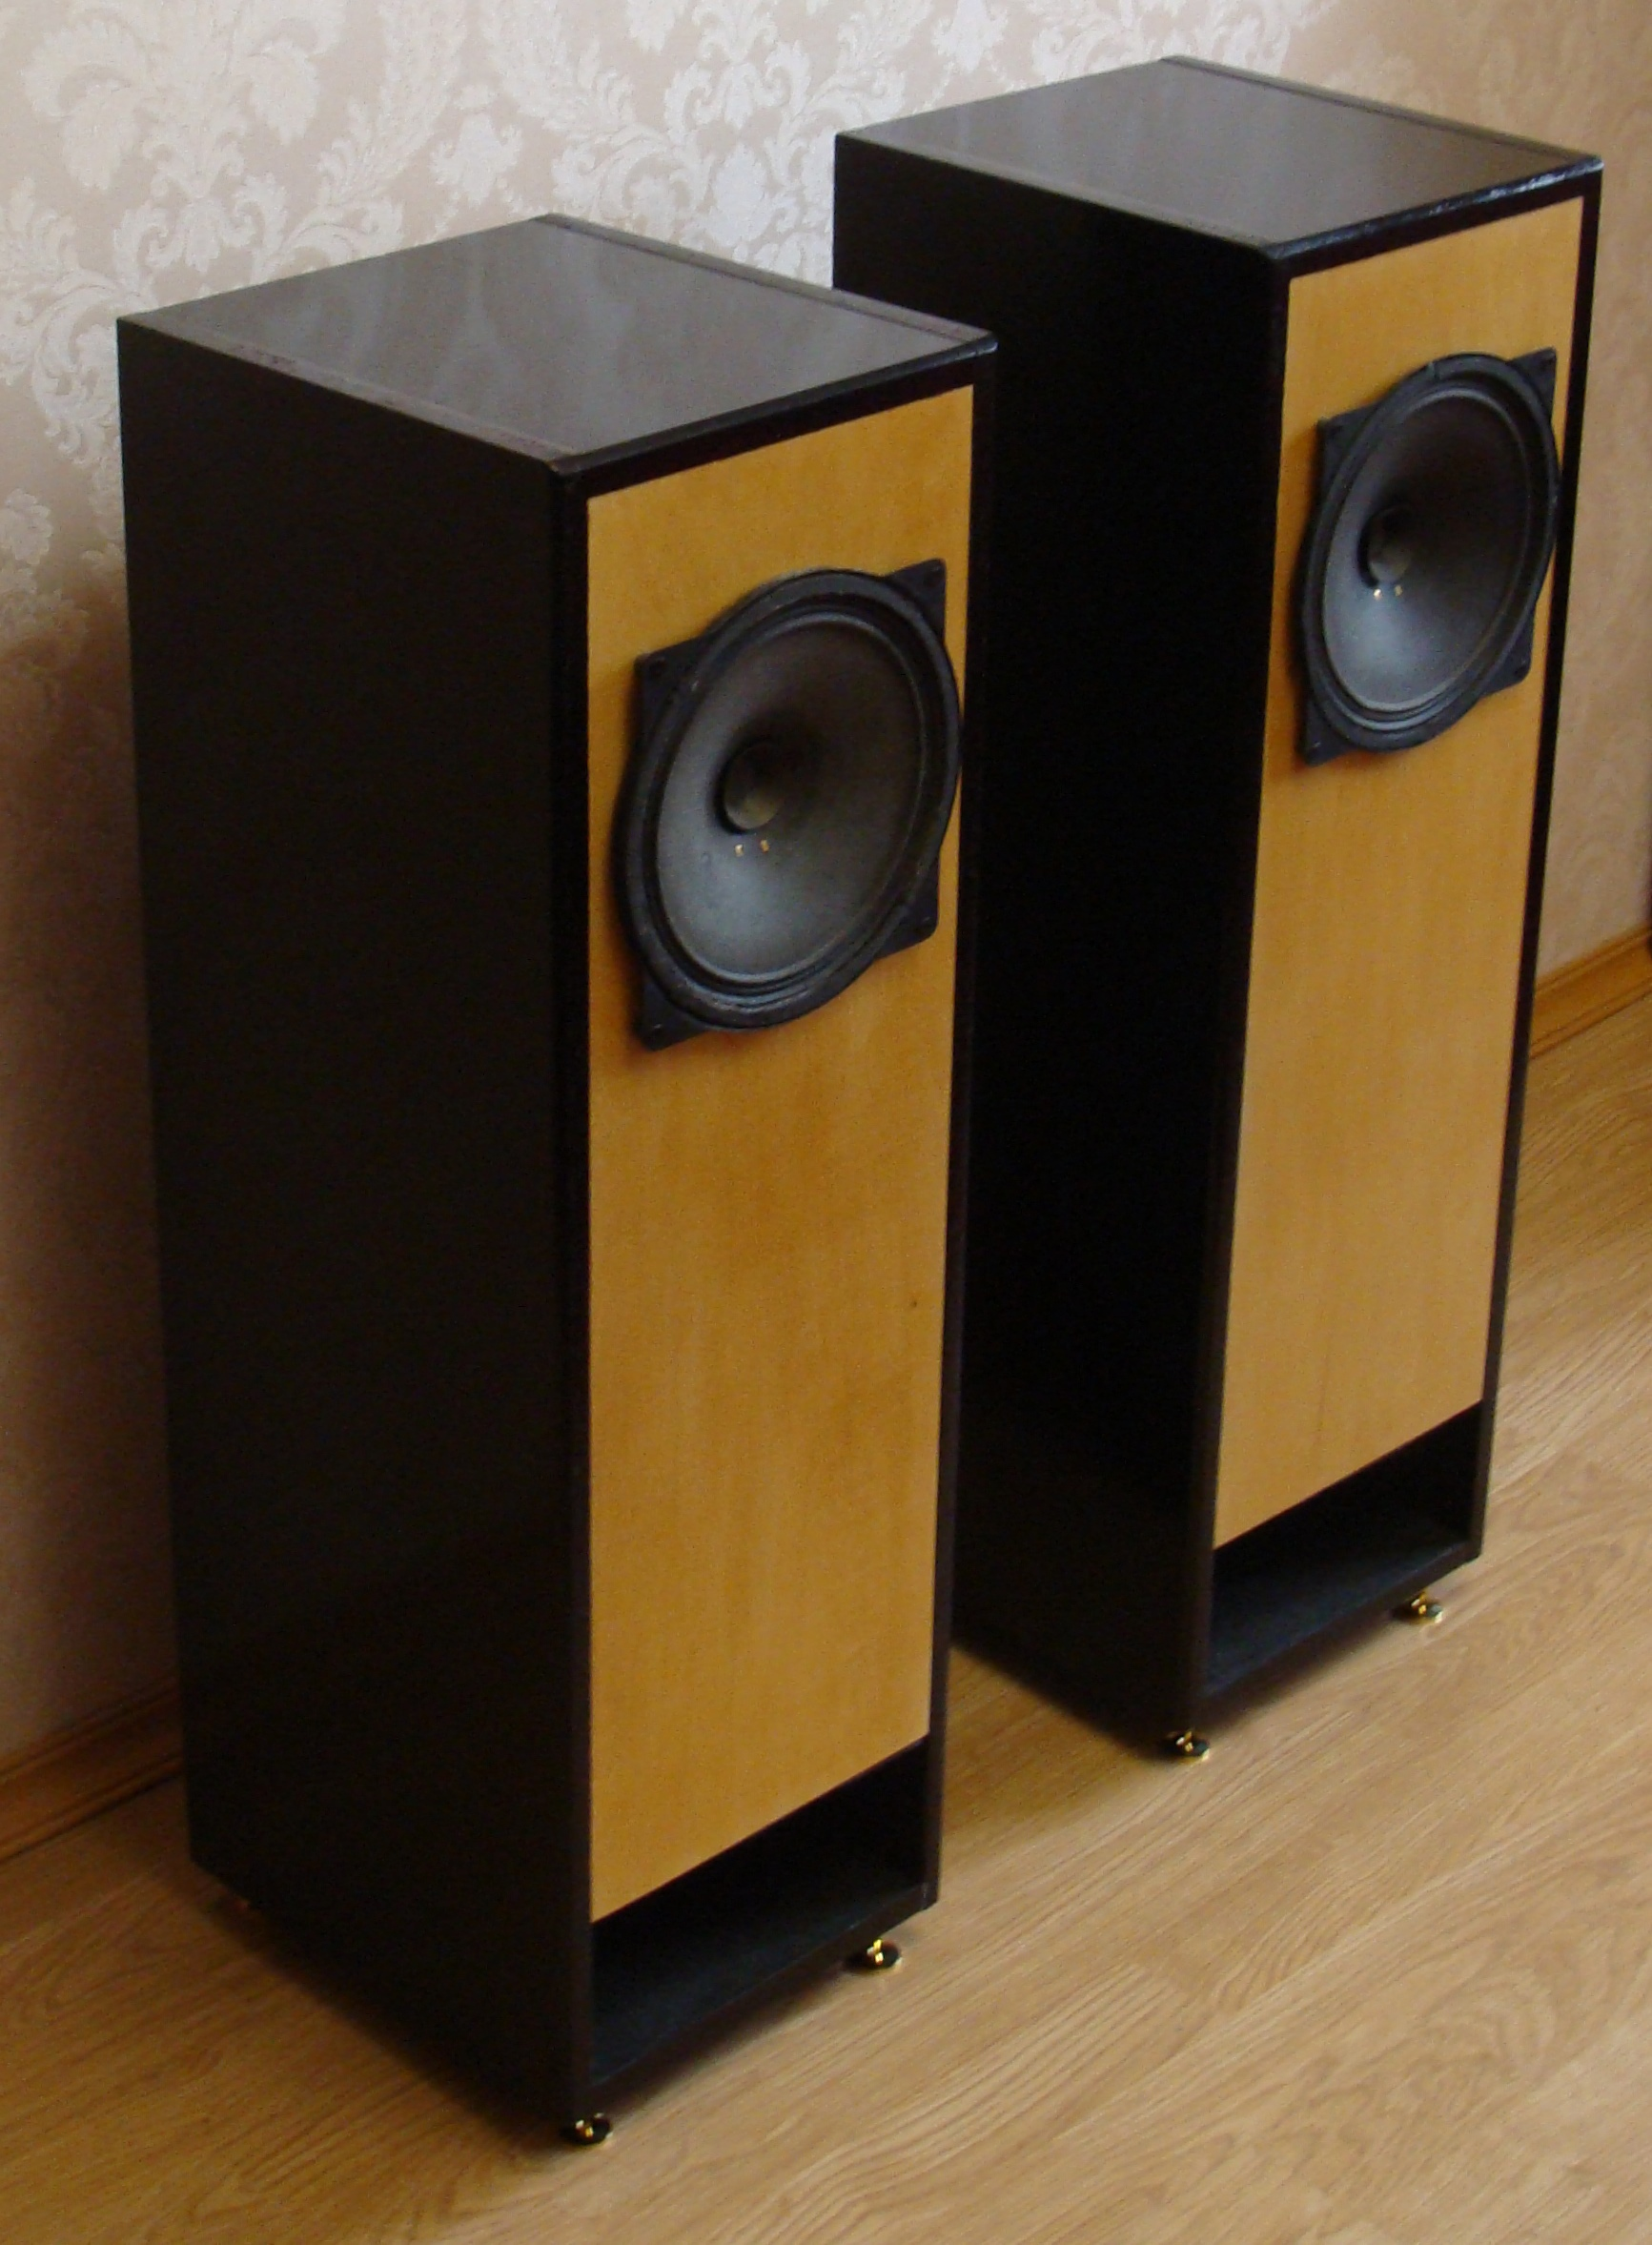 акустика на широкополосных динамиках 4ГД35